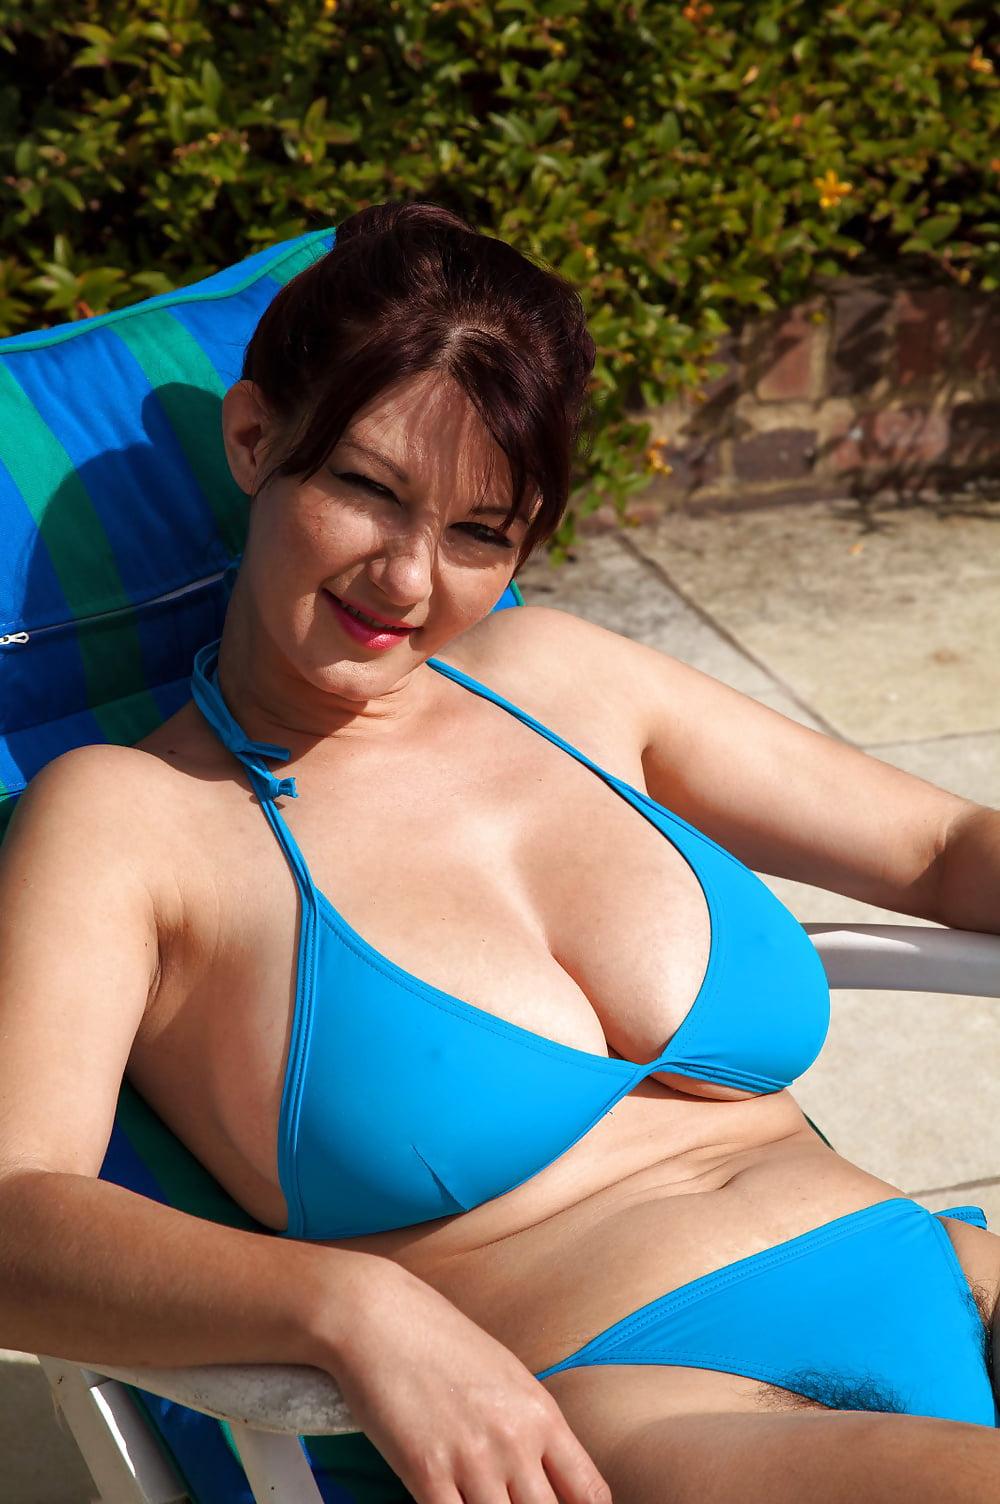 bikini wax a Need